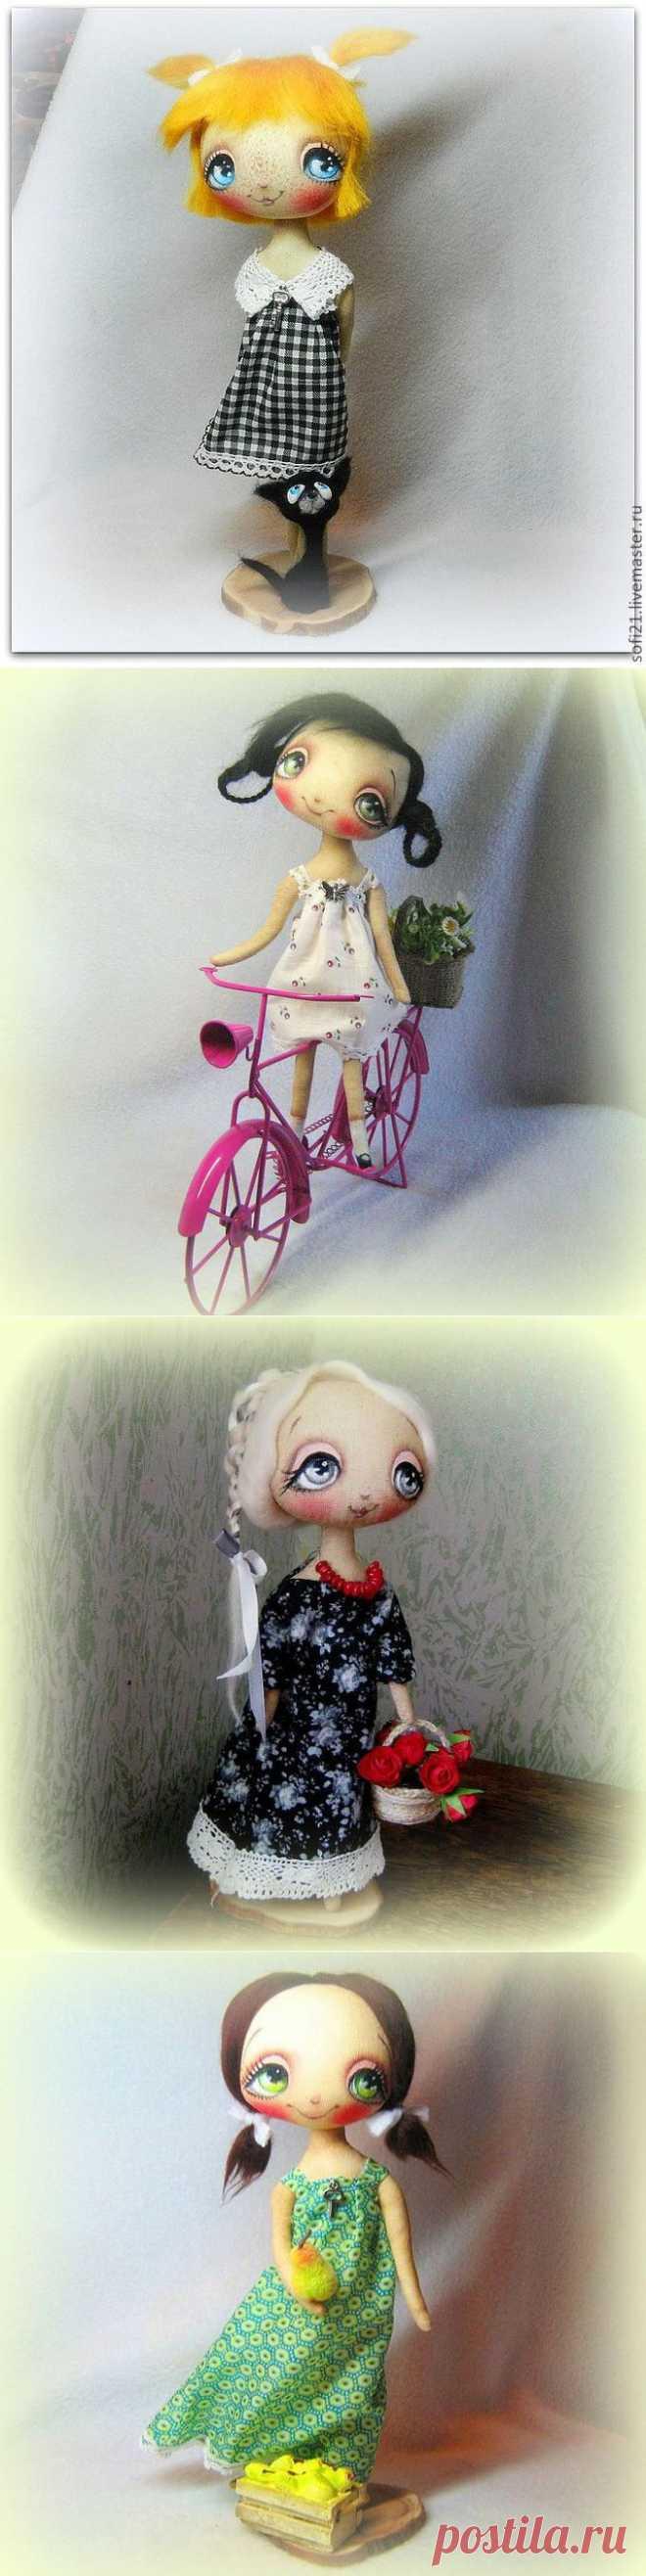 "милые куклы от ""Софи"" Александра Рипка (Украина, Киев)."